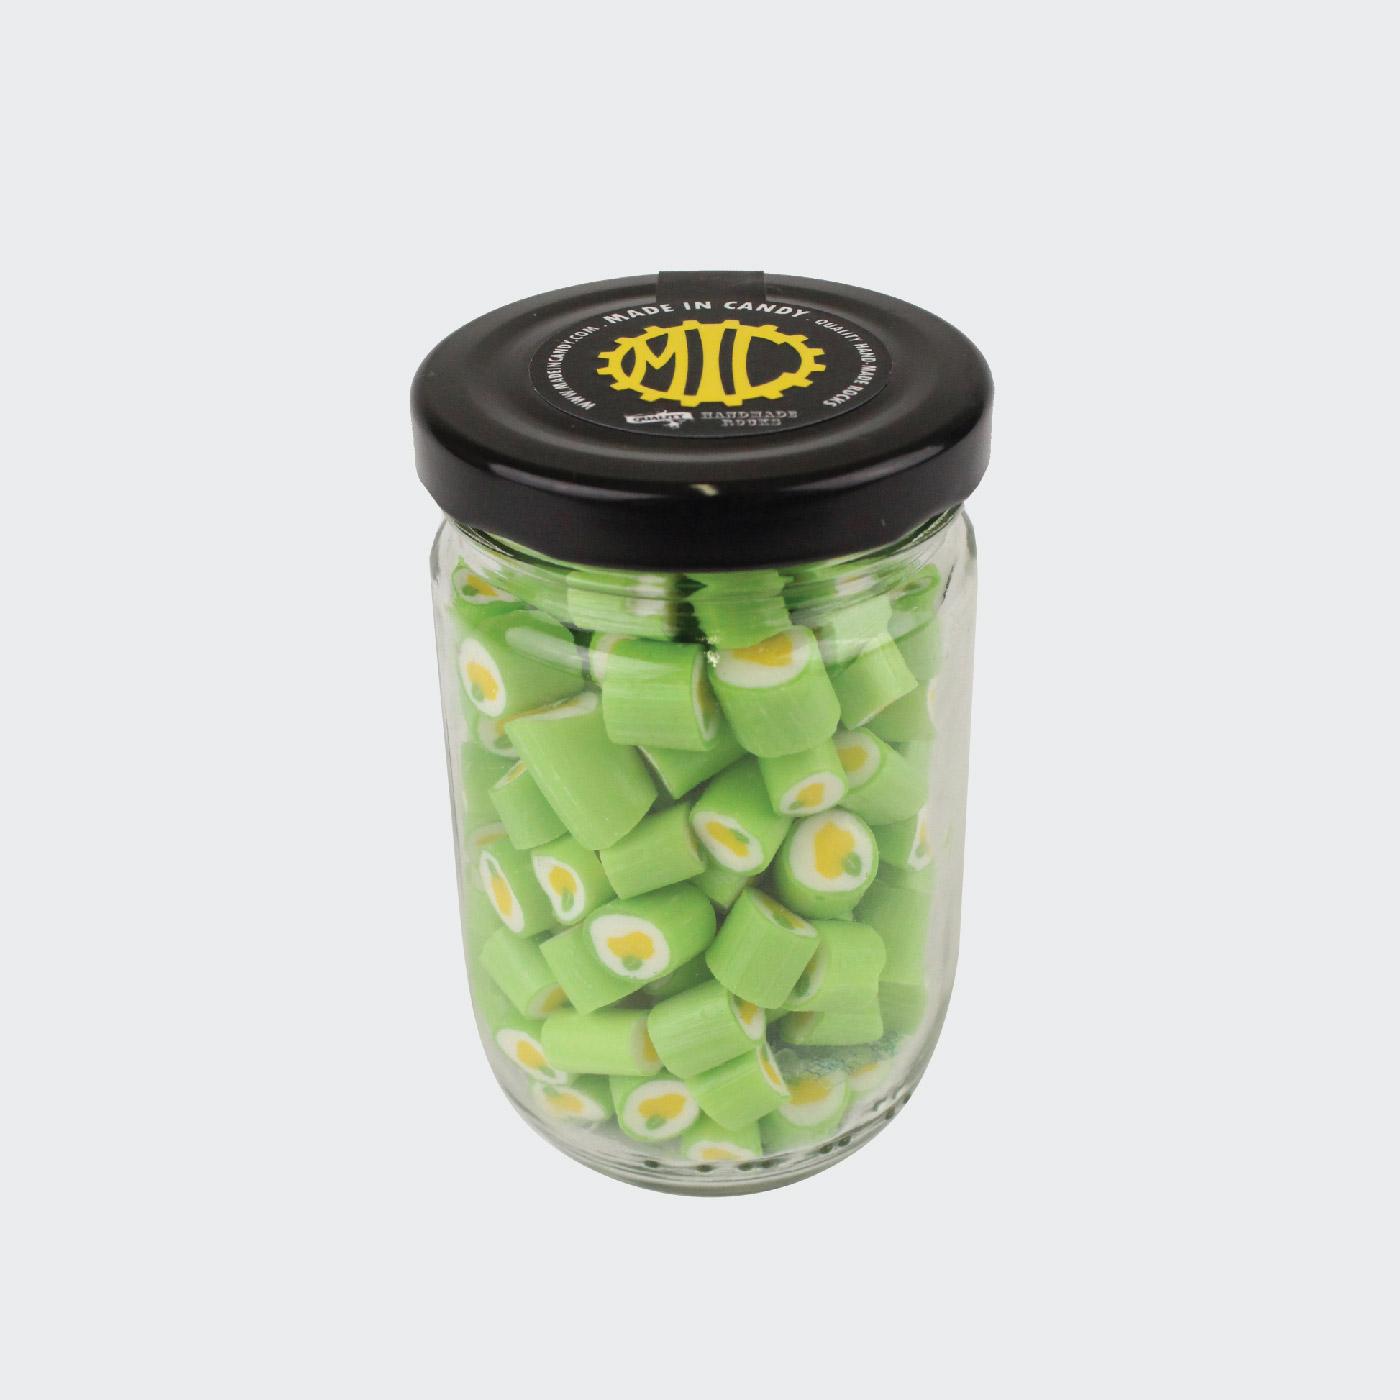 Large Jar of Mango (160g. Jar)